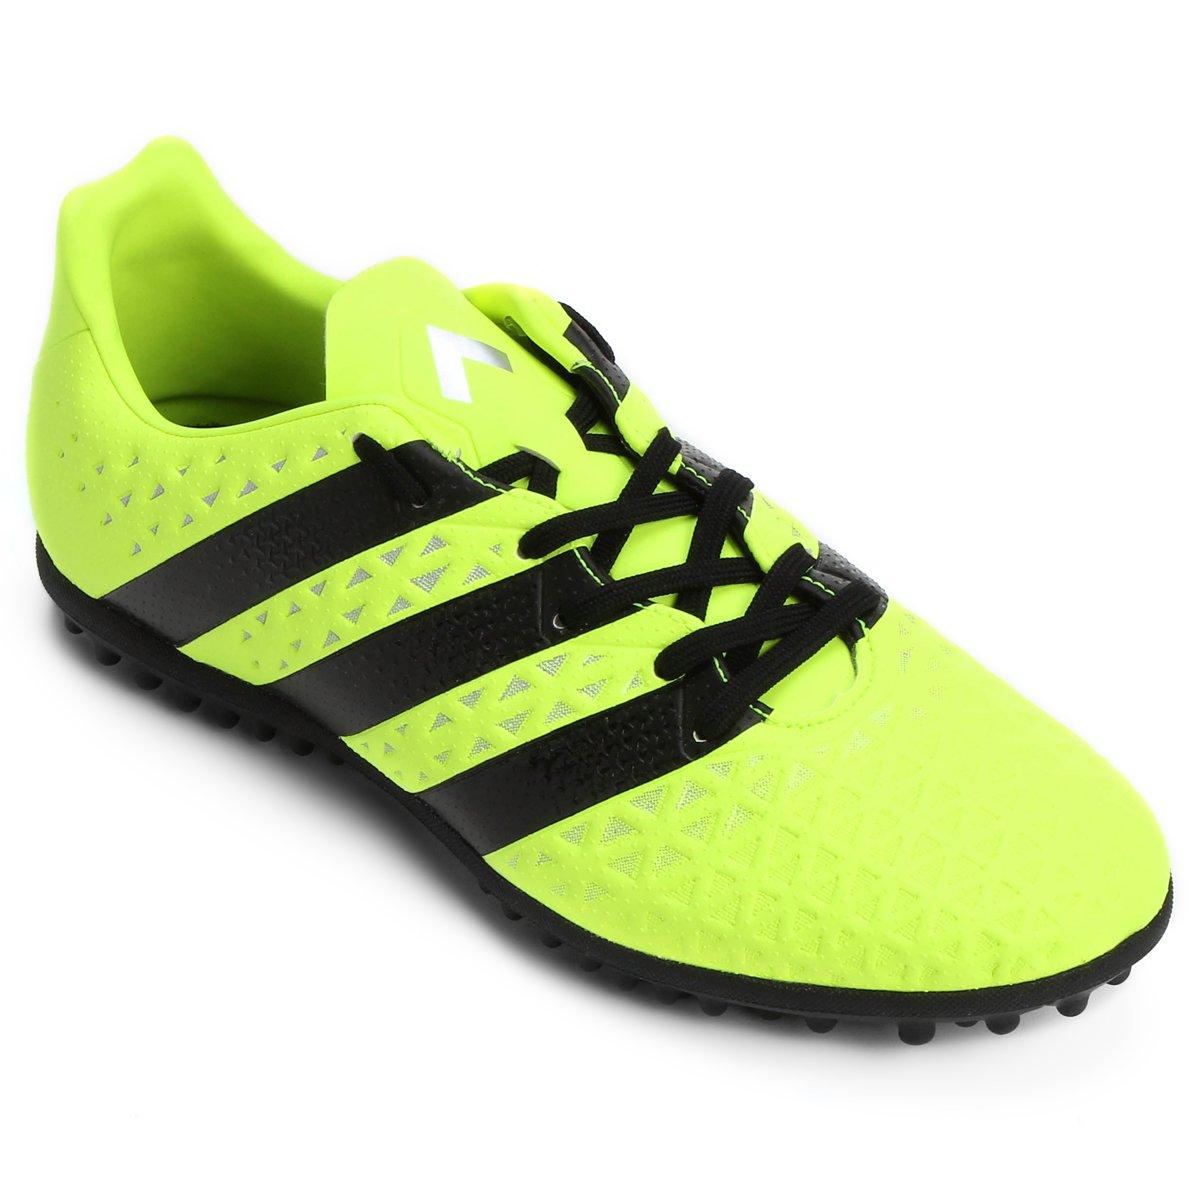 5f38f6b75b Chuteira Society Adidas Ace 16.3 TF Masculina - Verde Limão e Preto ...